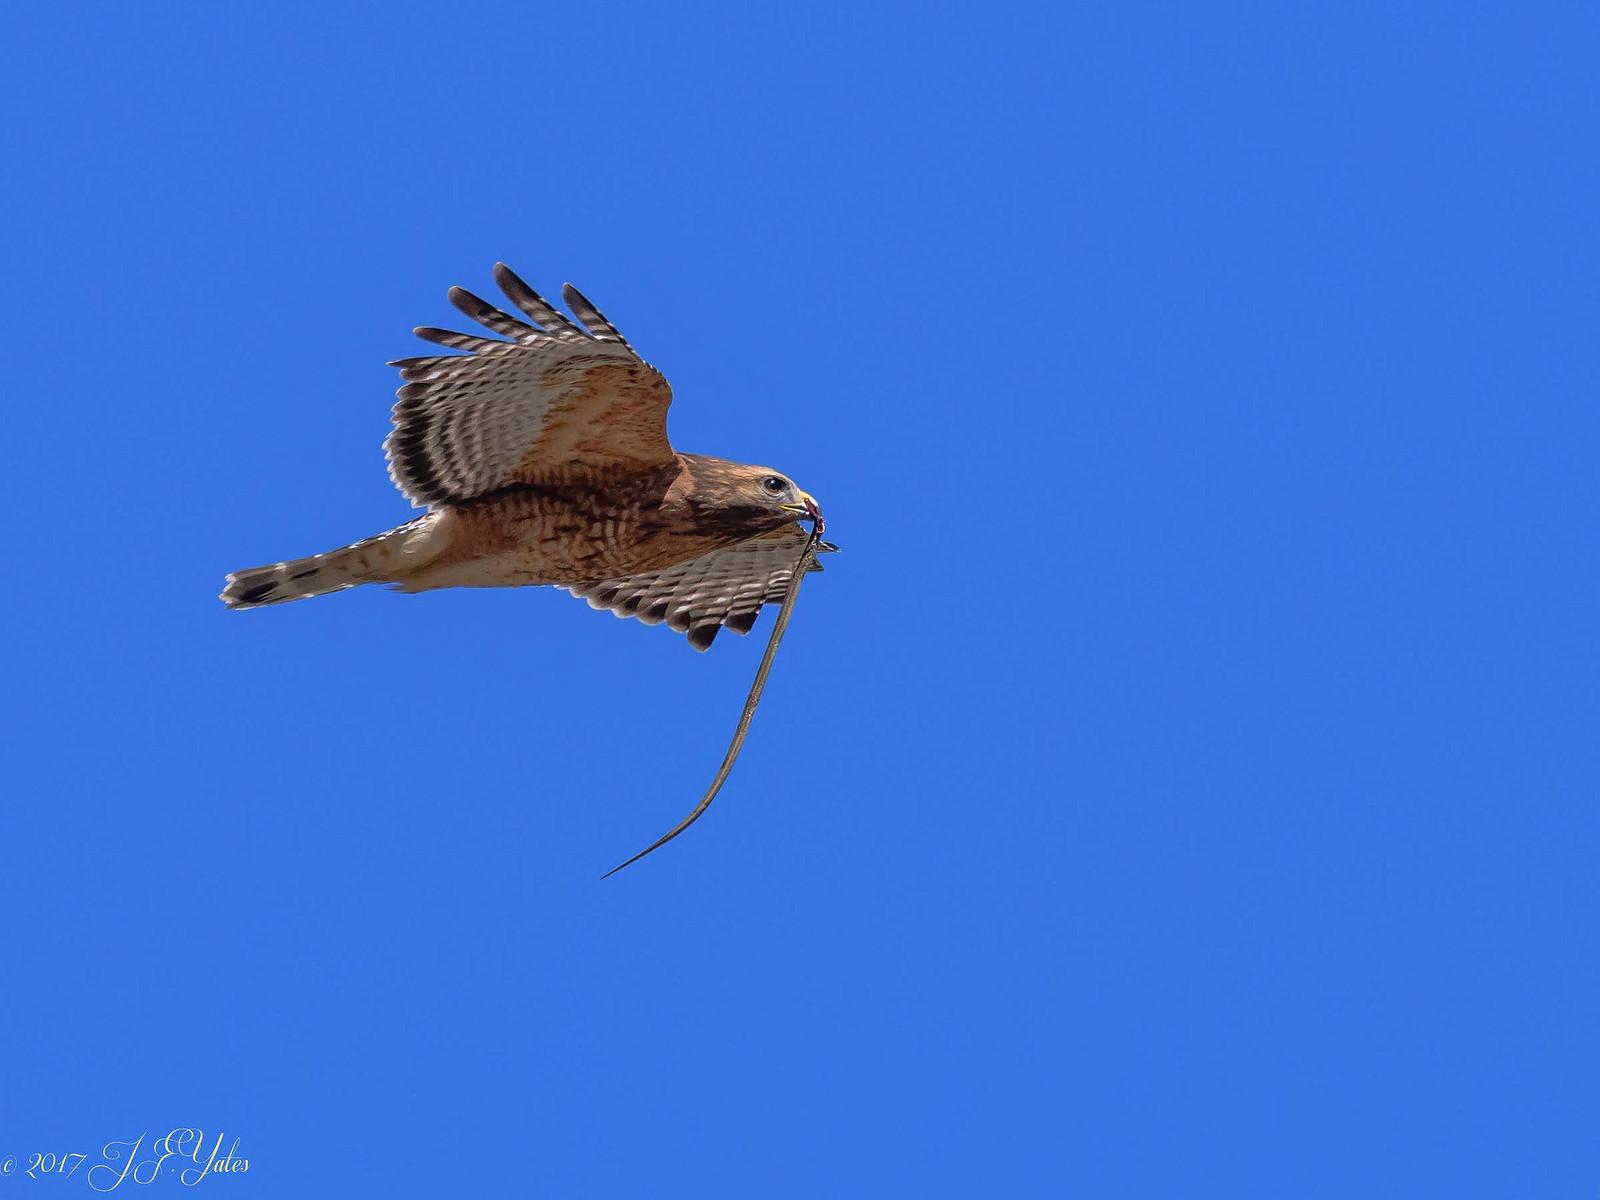 Red Shouldered Hawk with snake